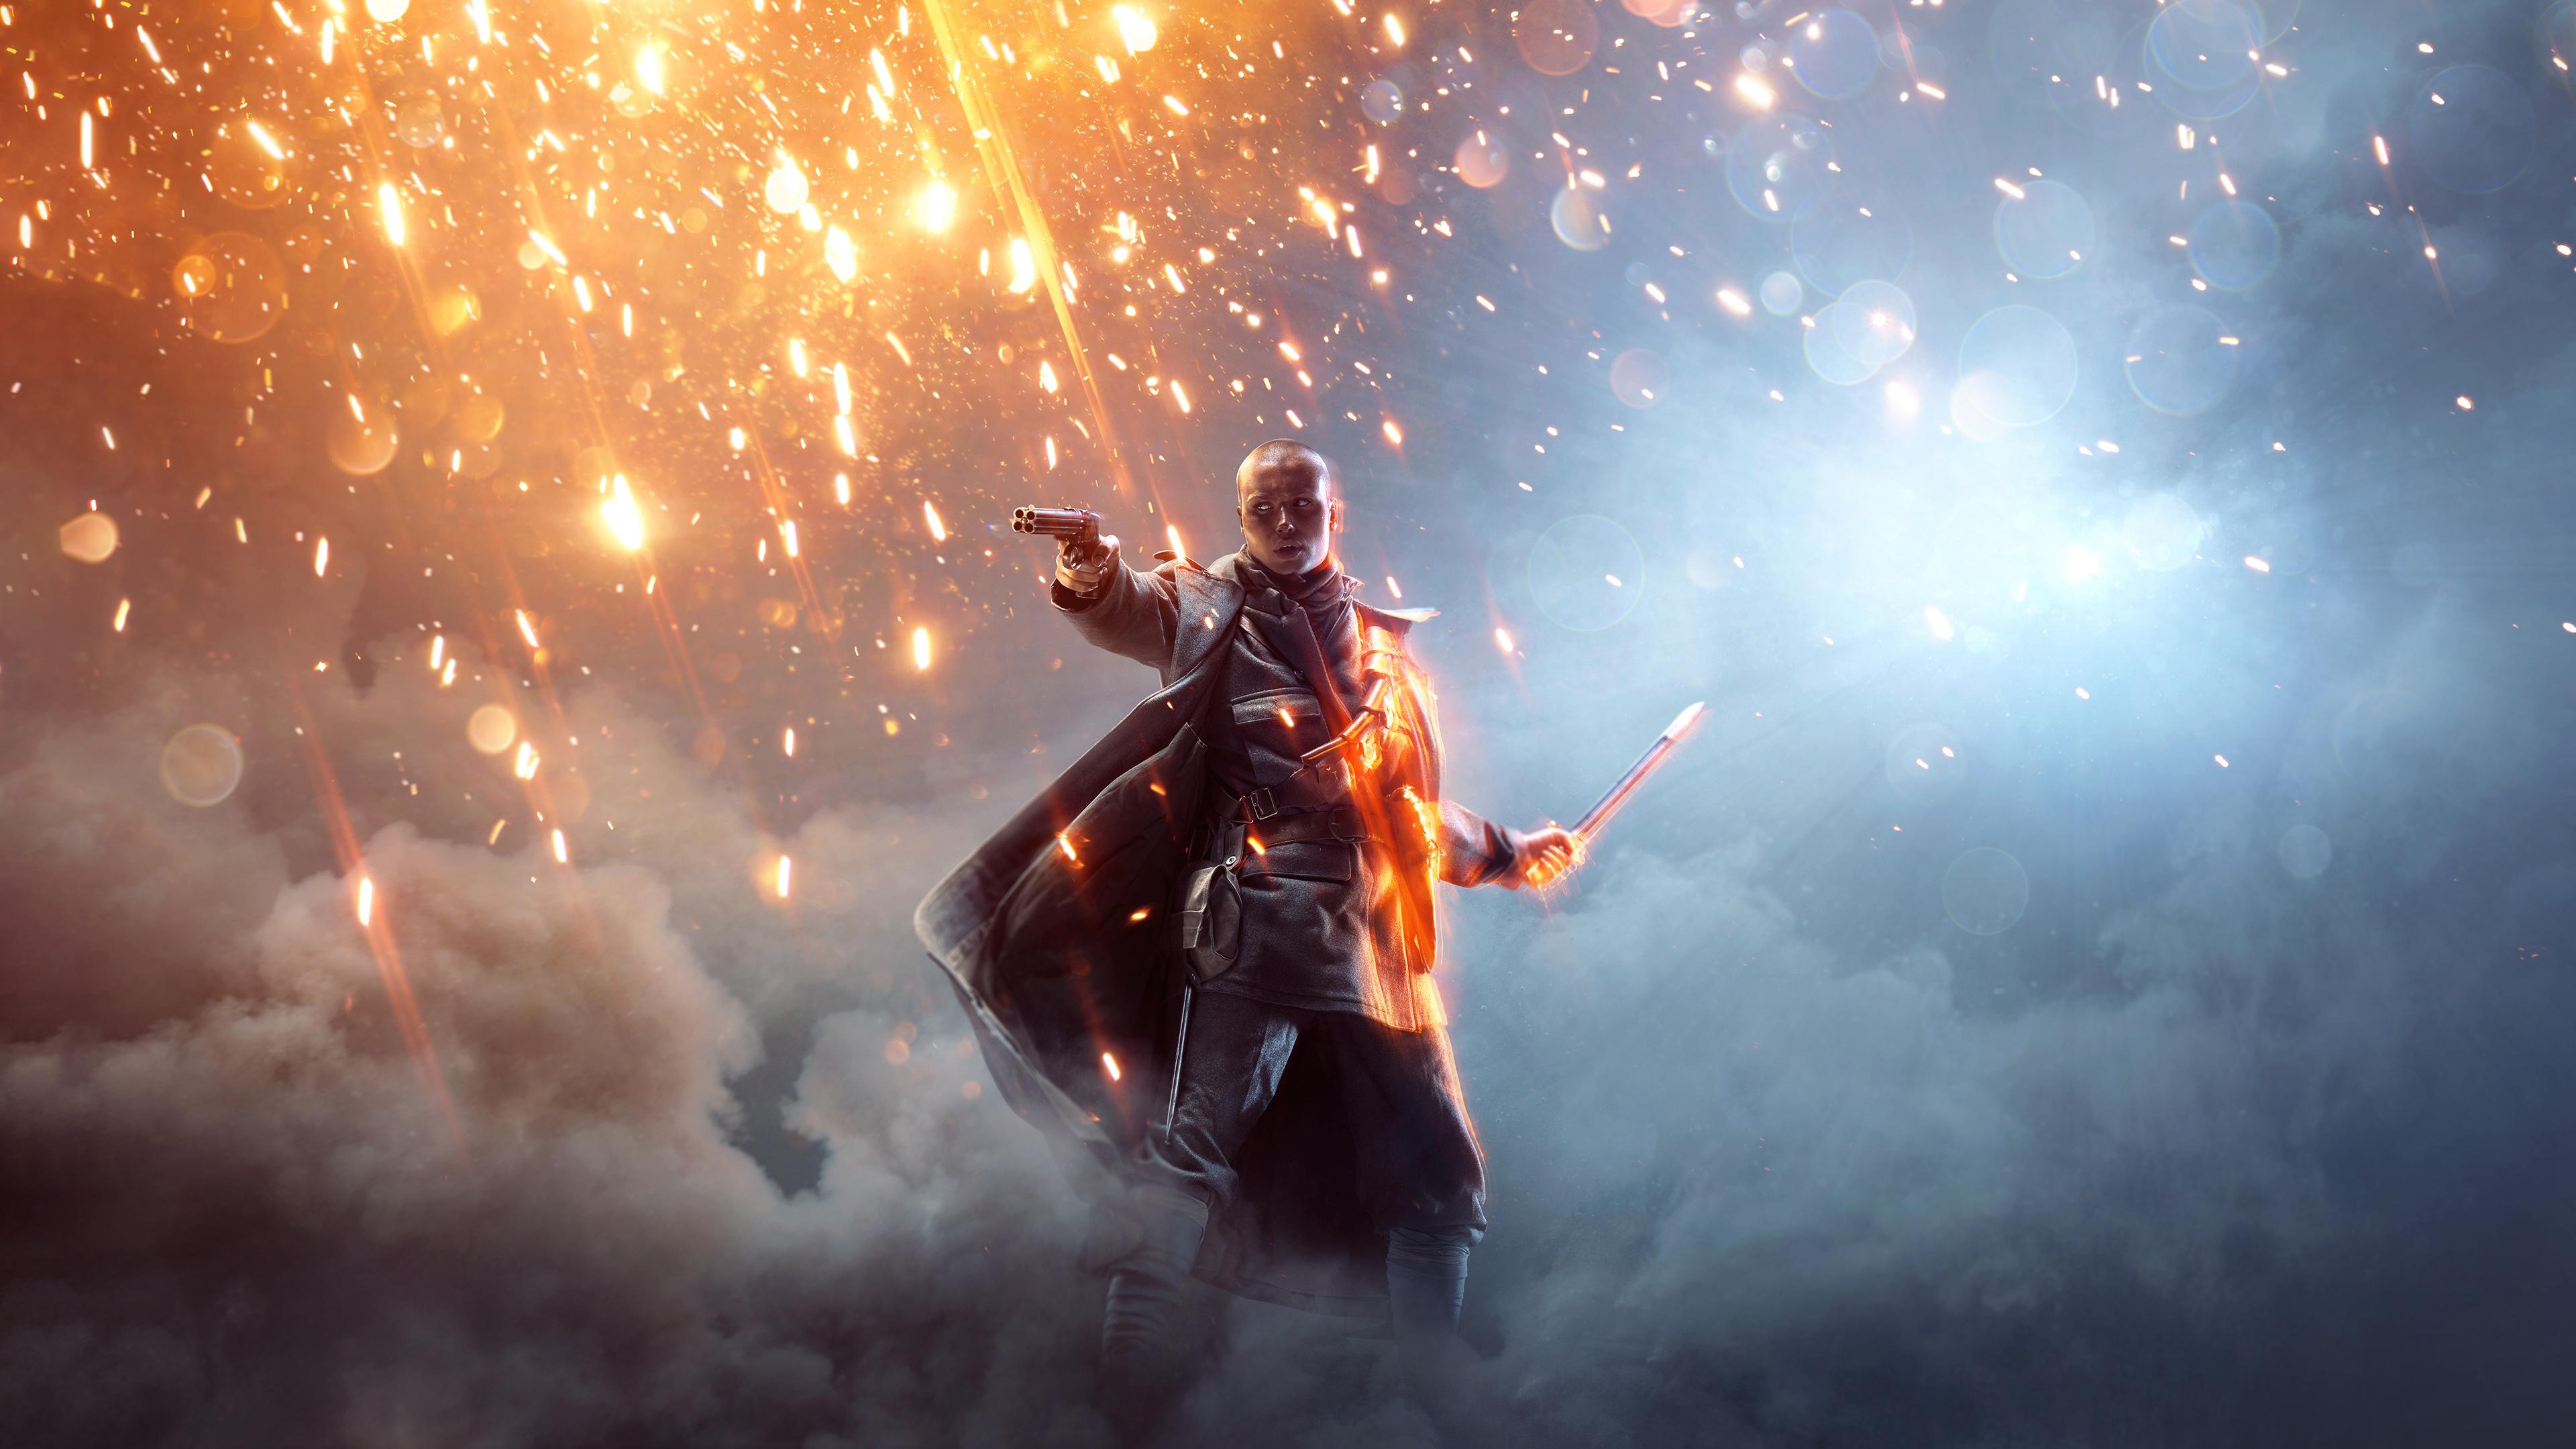 Download 3840x2400 Wallpaper Battlefield 1 Revolution